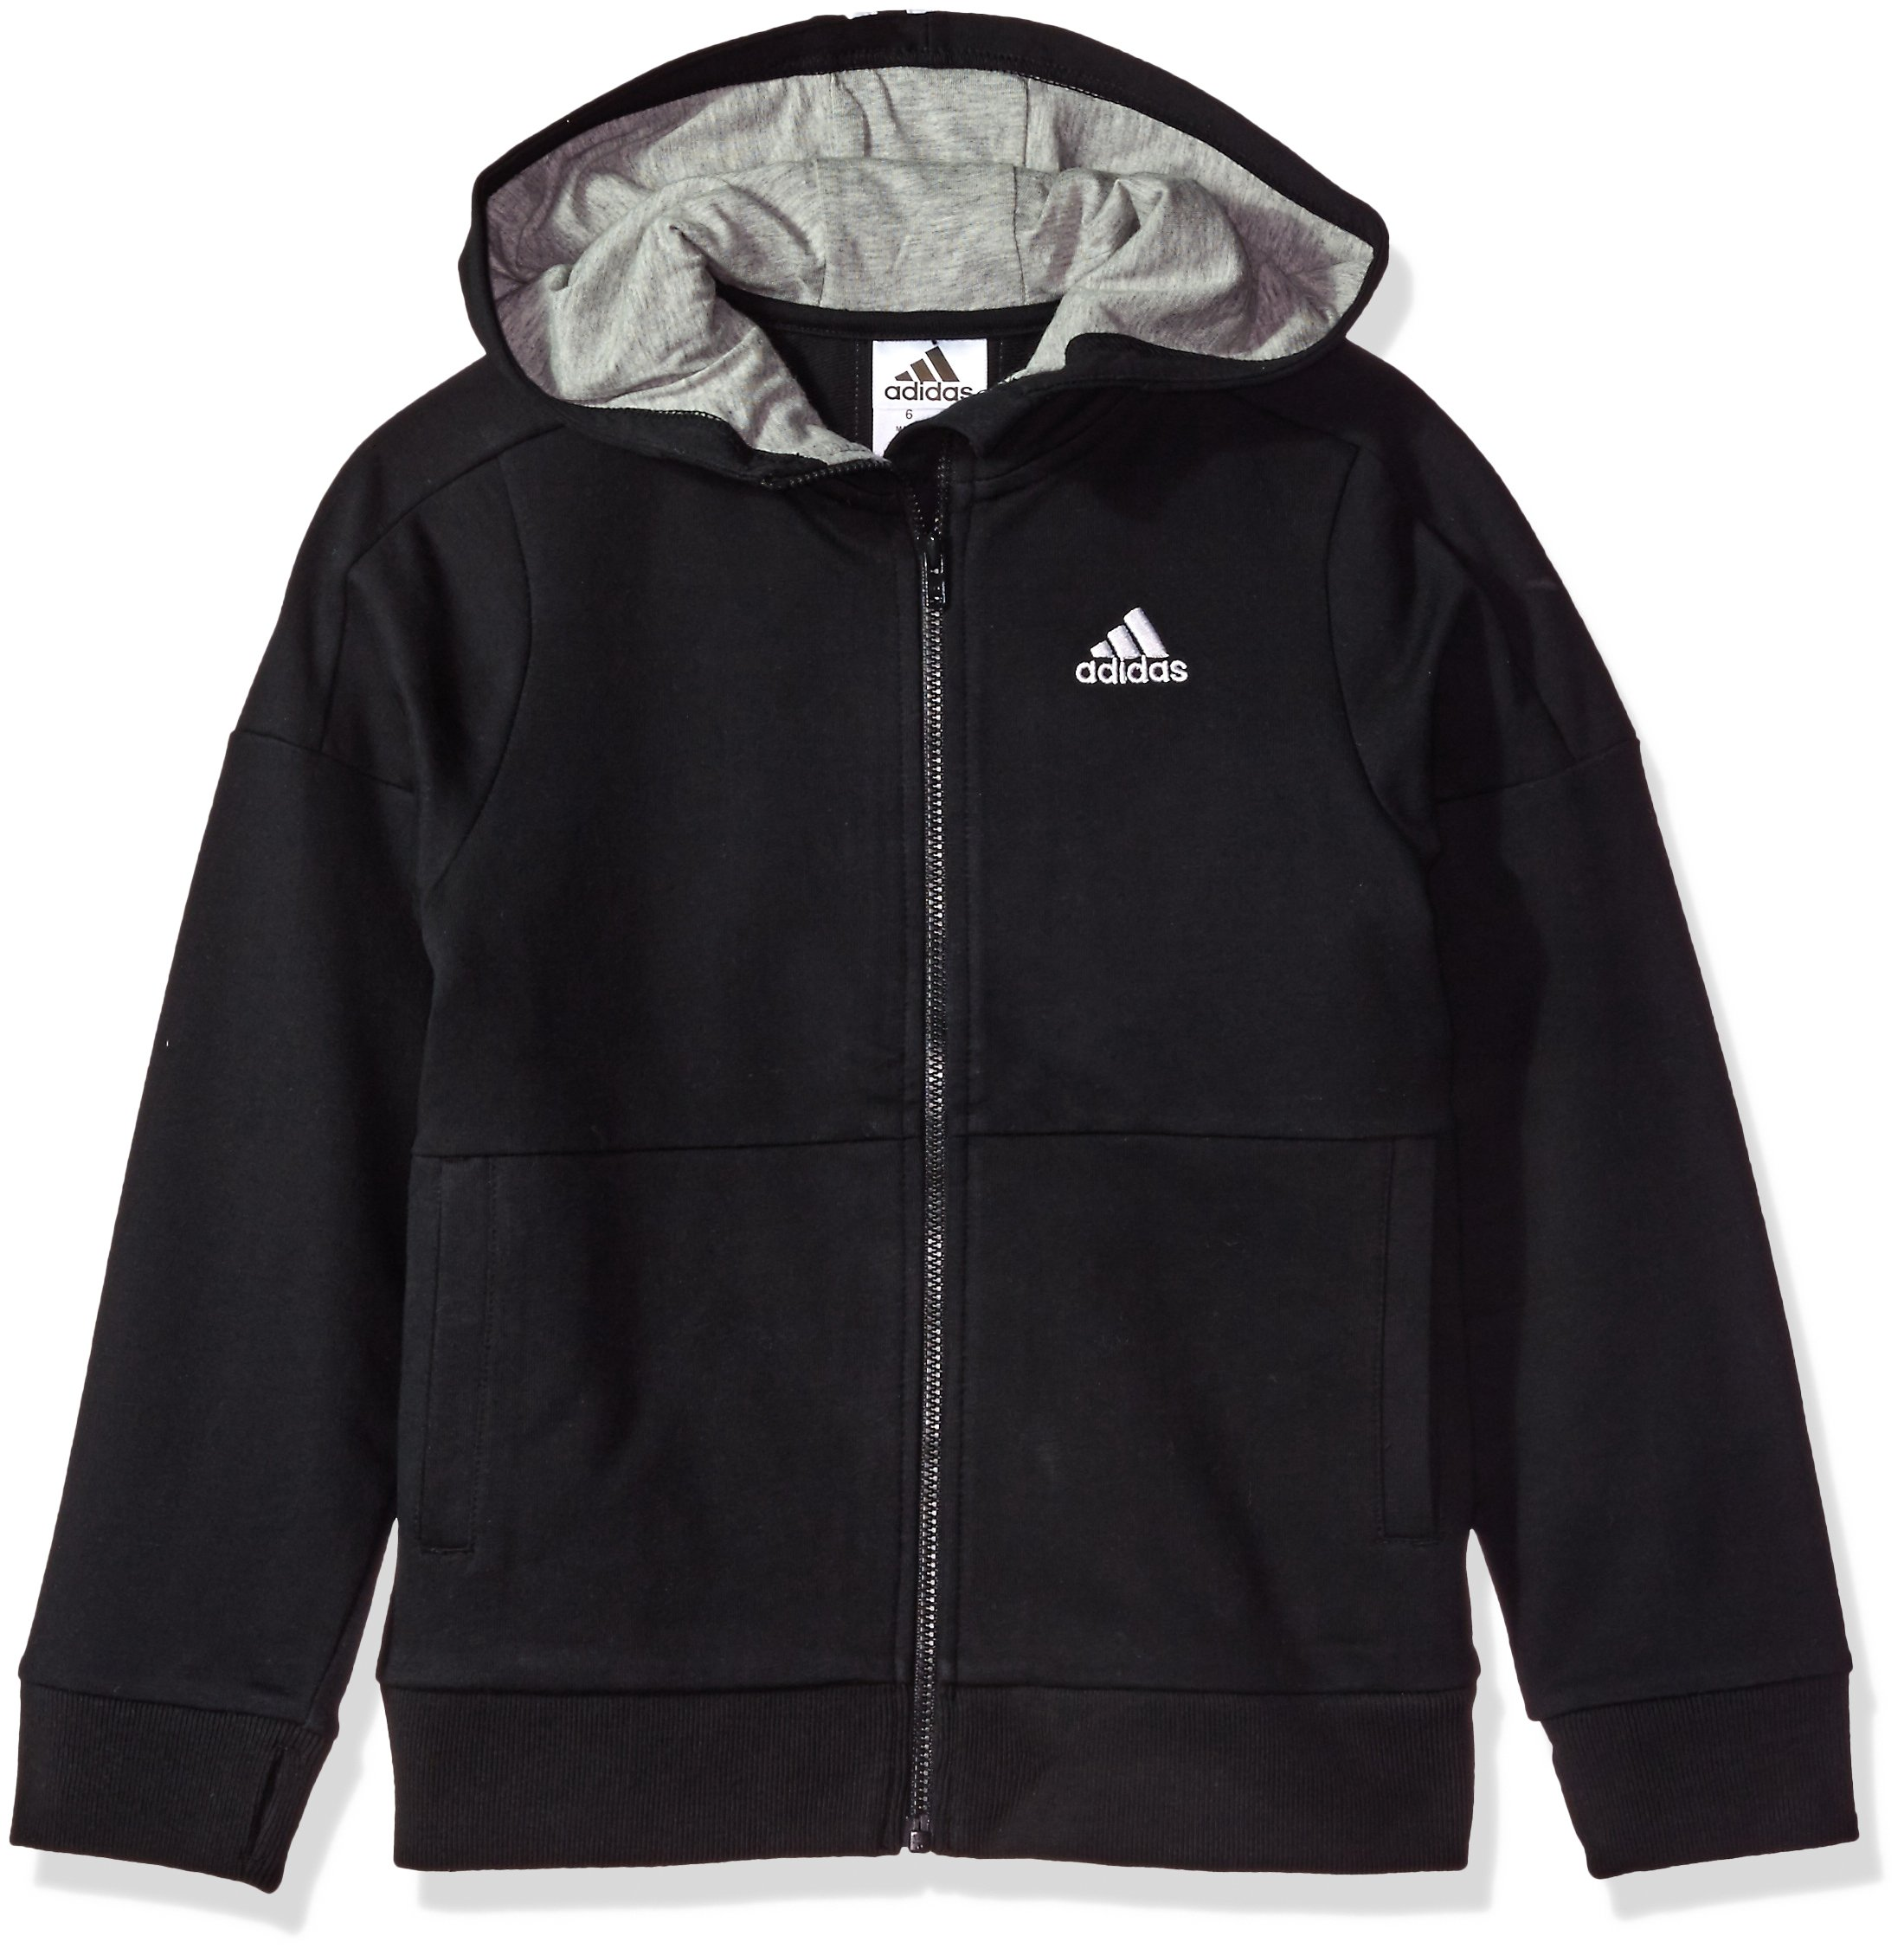 adidas Boys' Big Athletics Jacket, Black, M